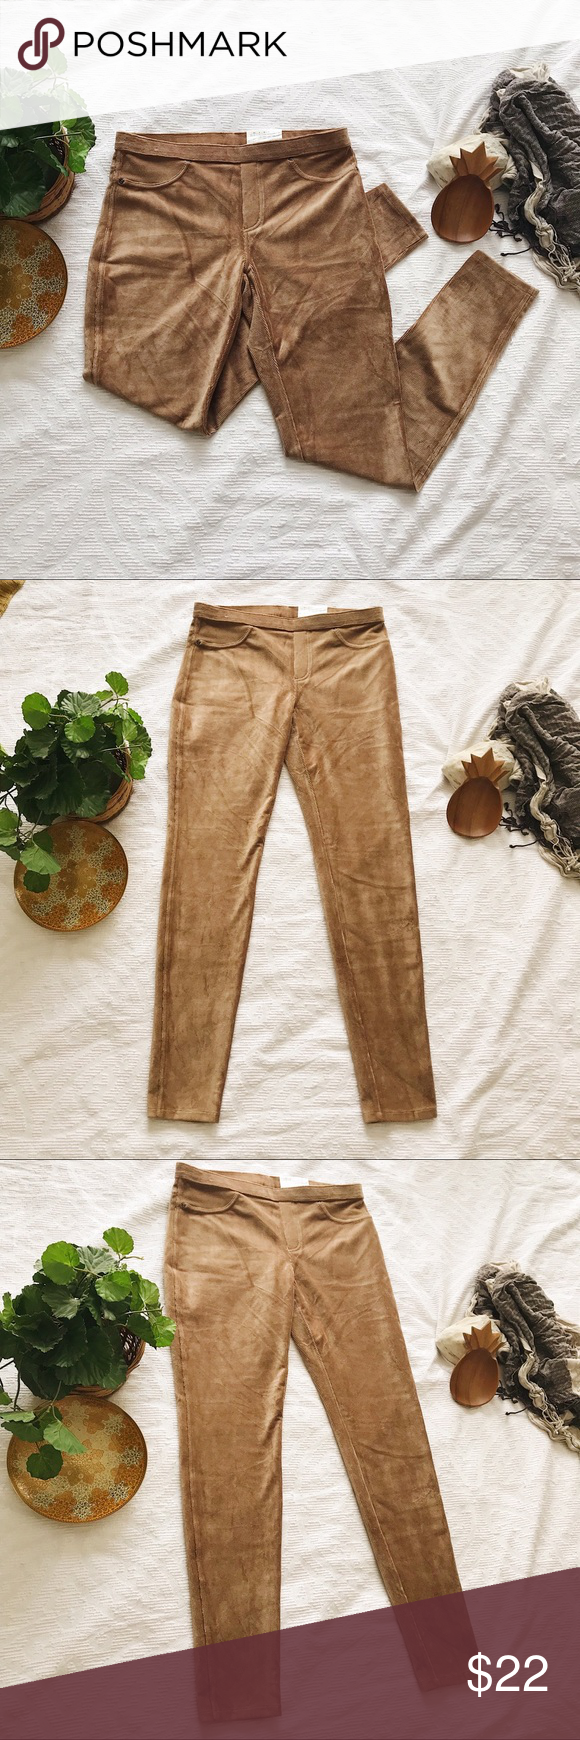 2fad0d73ef3cb HUE • Corduroy Leggings Caramel Tan Stretch Jean • HUE • women's size  medium • super soft, stretchy corduroy Leggings. Elastic waistband, fake  front pockets ...